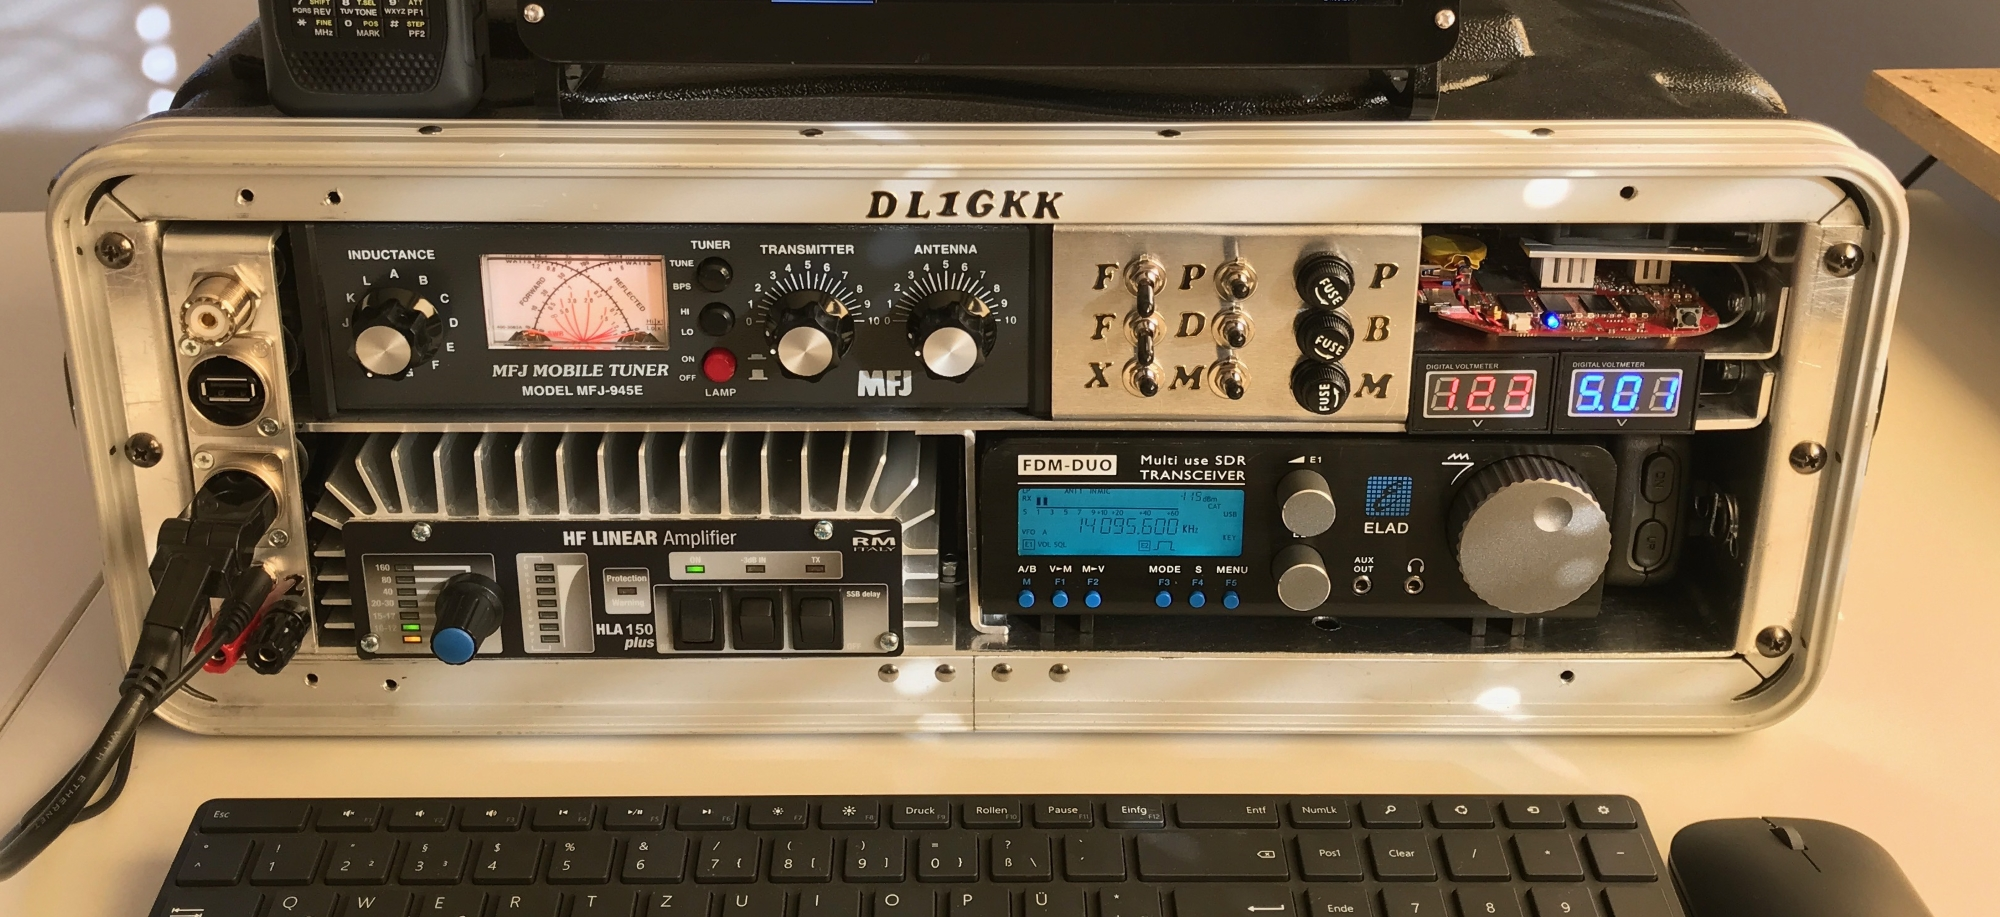 Amateur Radio Station Wb4omm: Portable Amateur Radio Station (go-box)